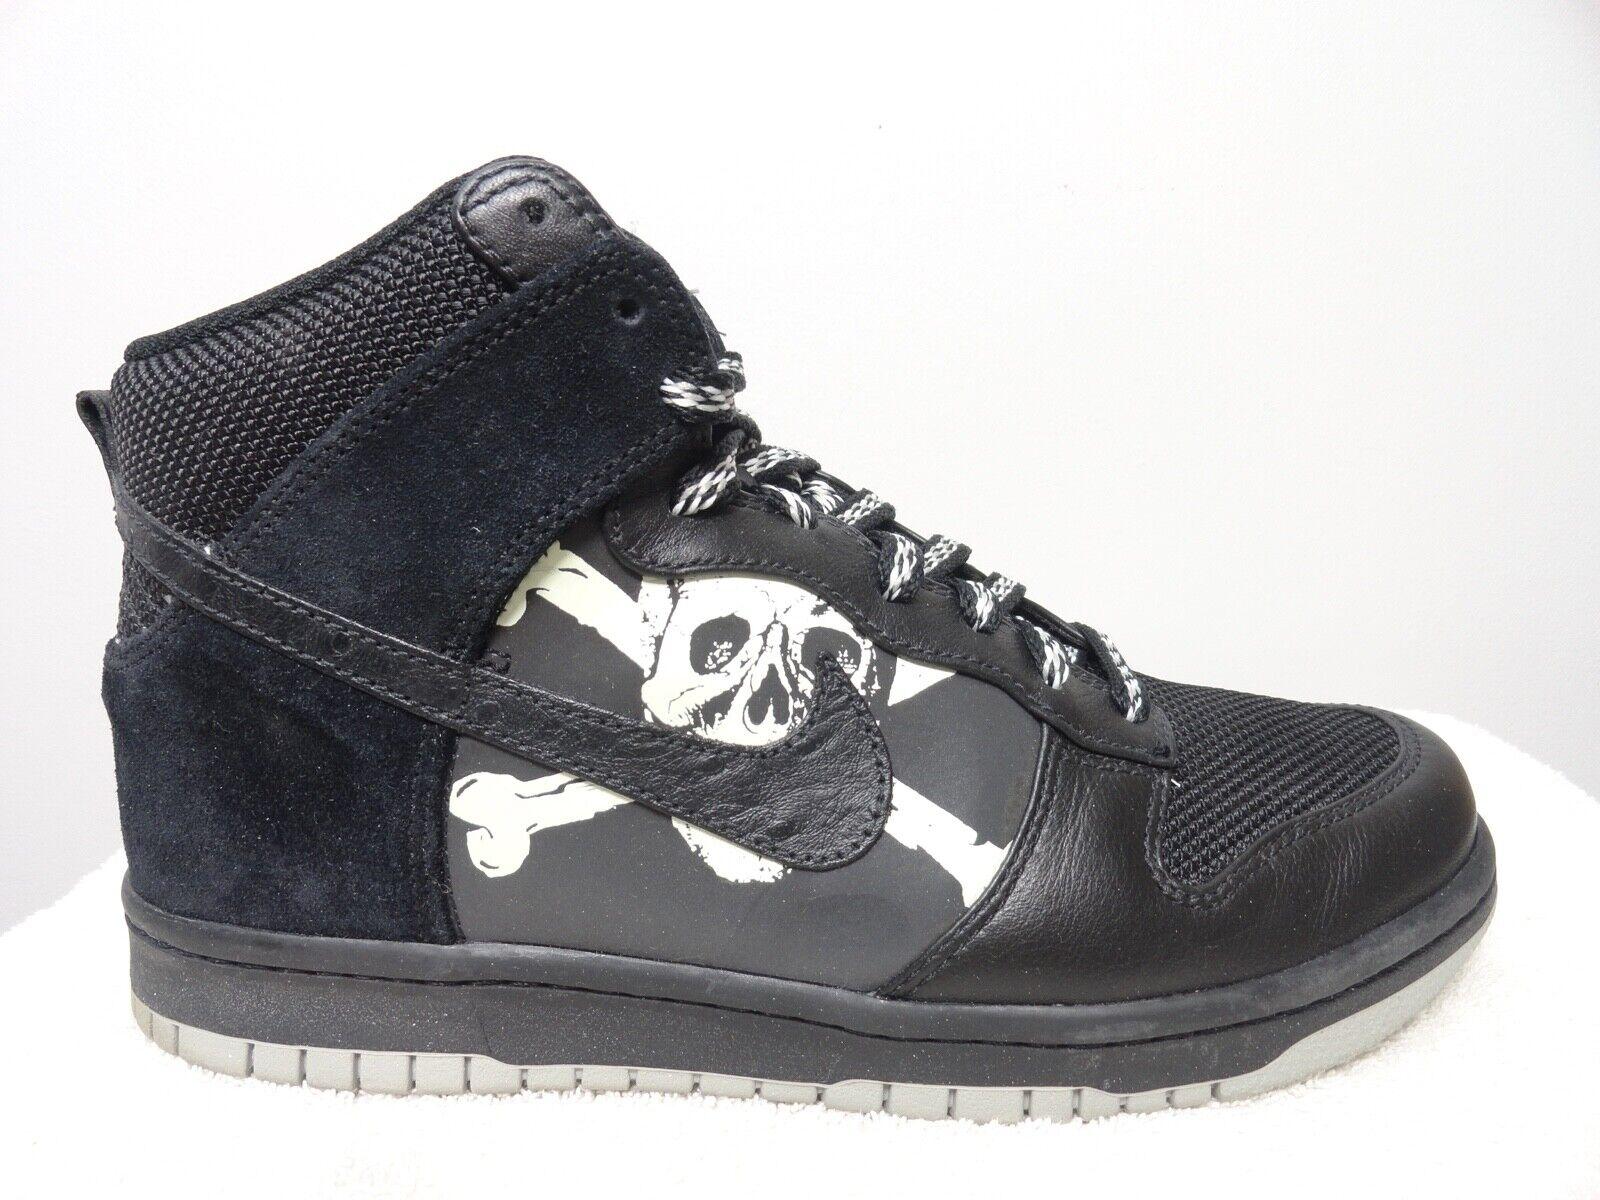 Nike Dunk high ST.PAULI  release in 2008 size 7  Rare